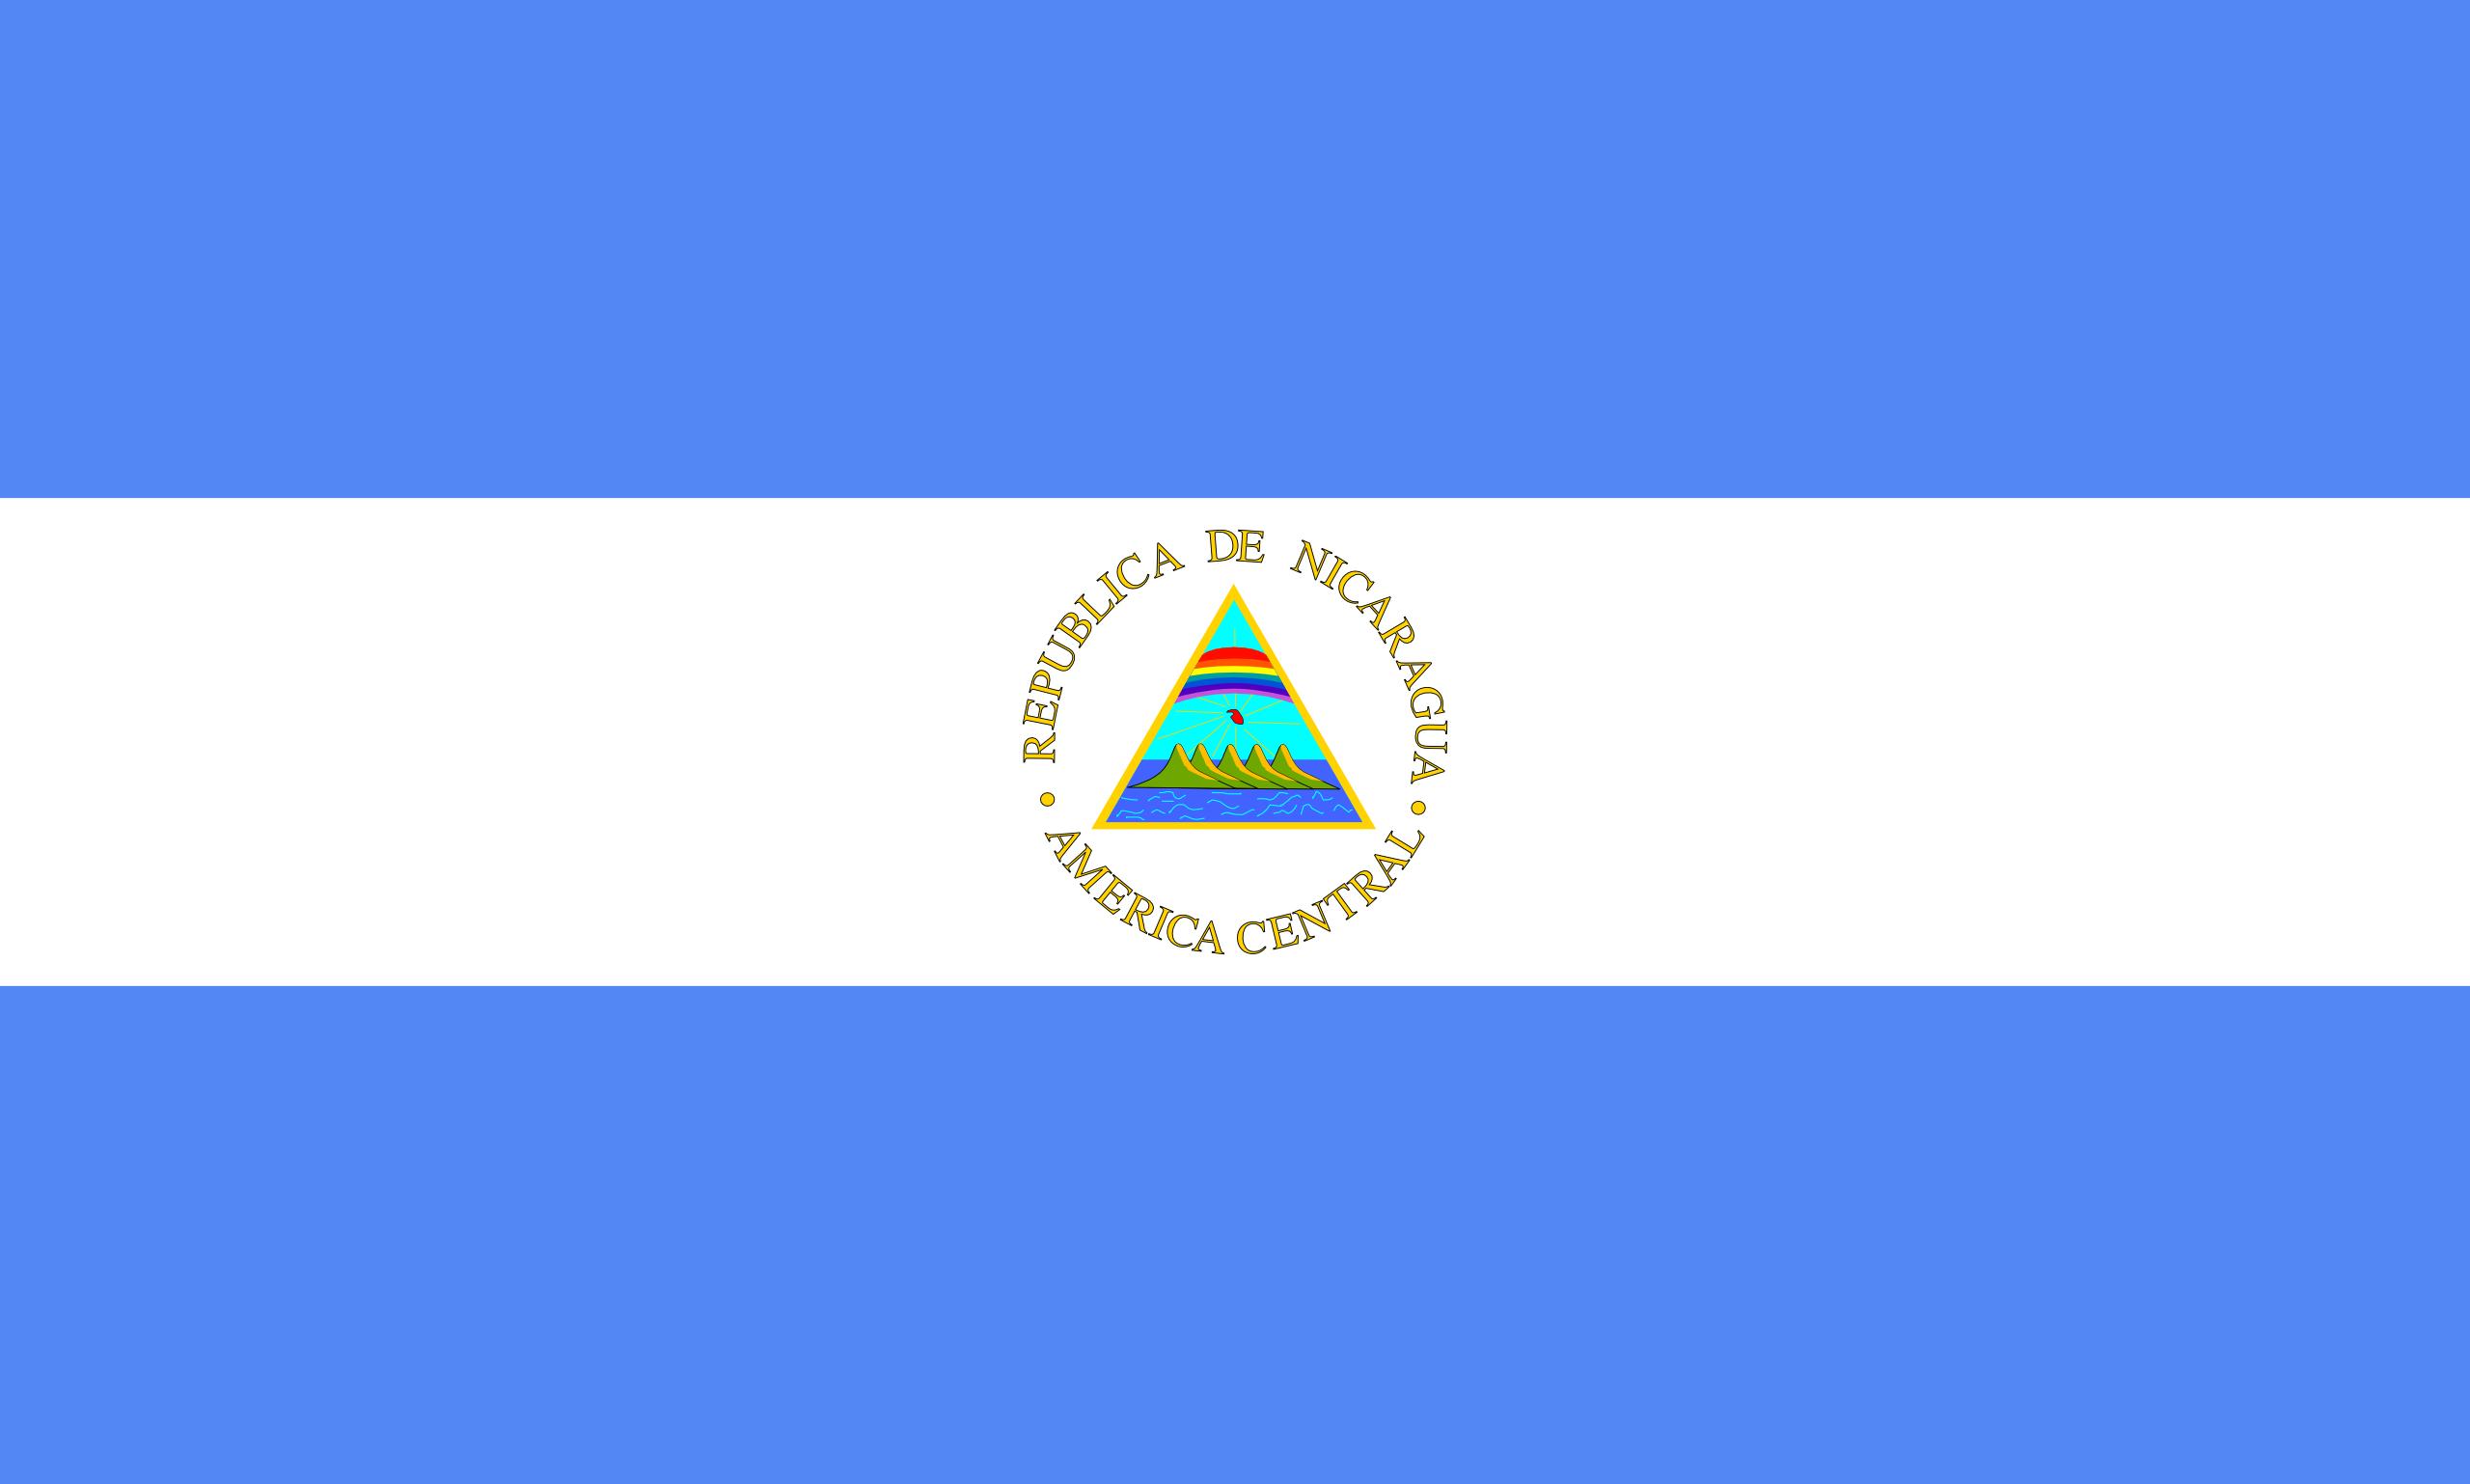 nicaragua, país, emblema, insignia, символ - Обои HD - Профессор falken.com